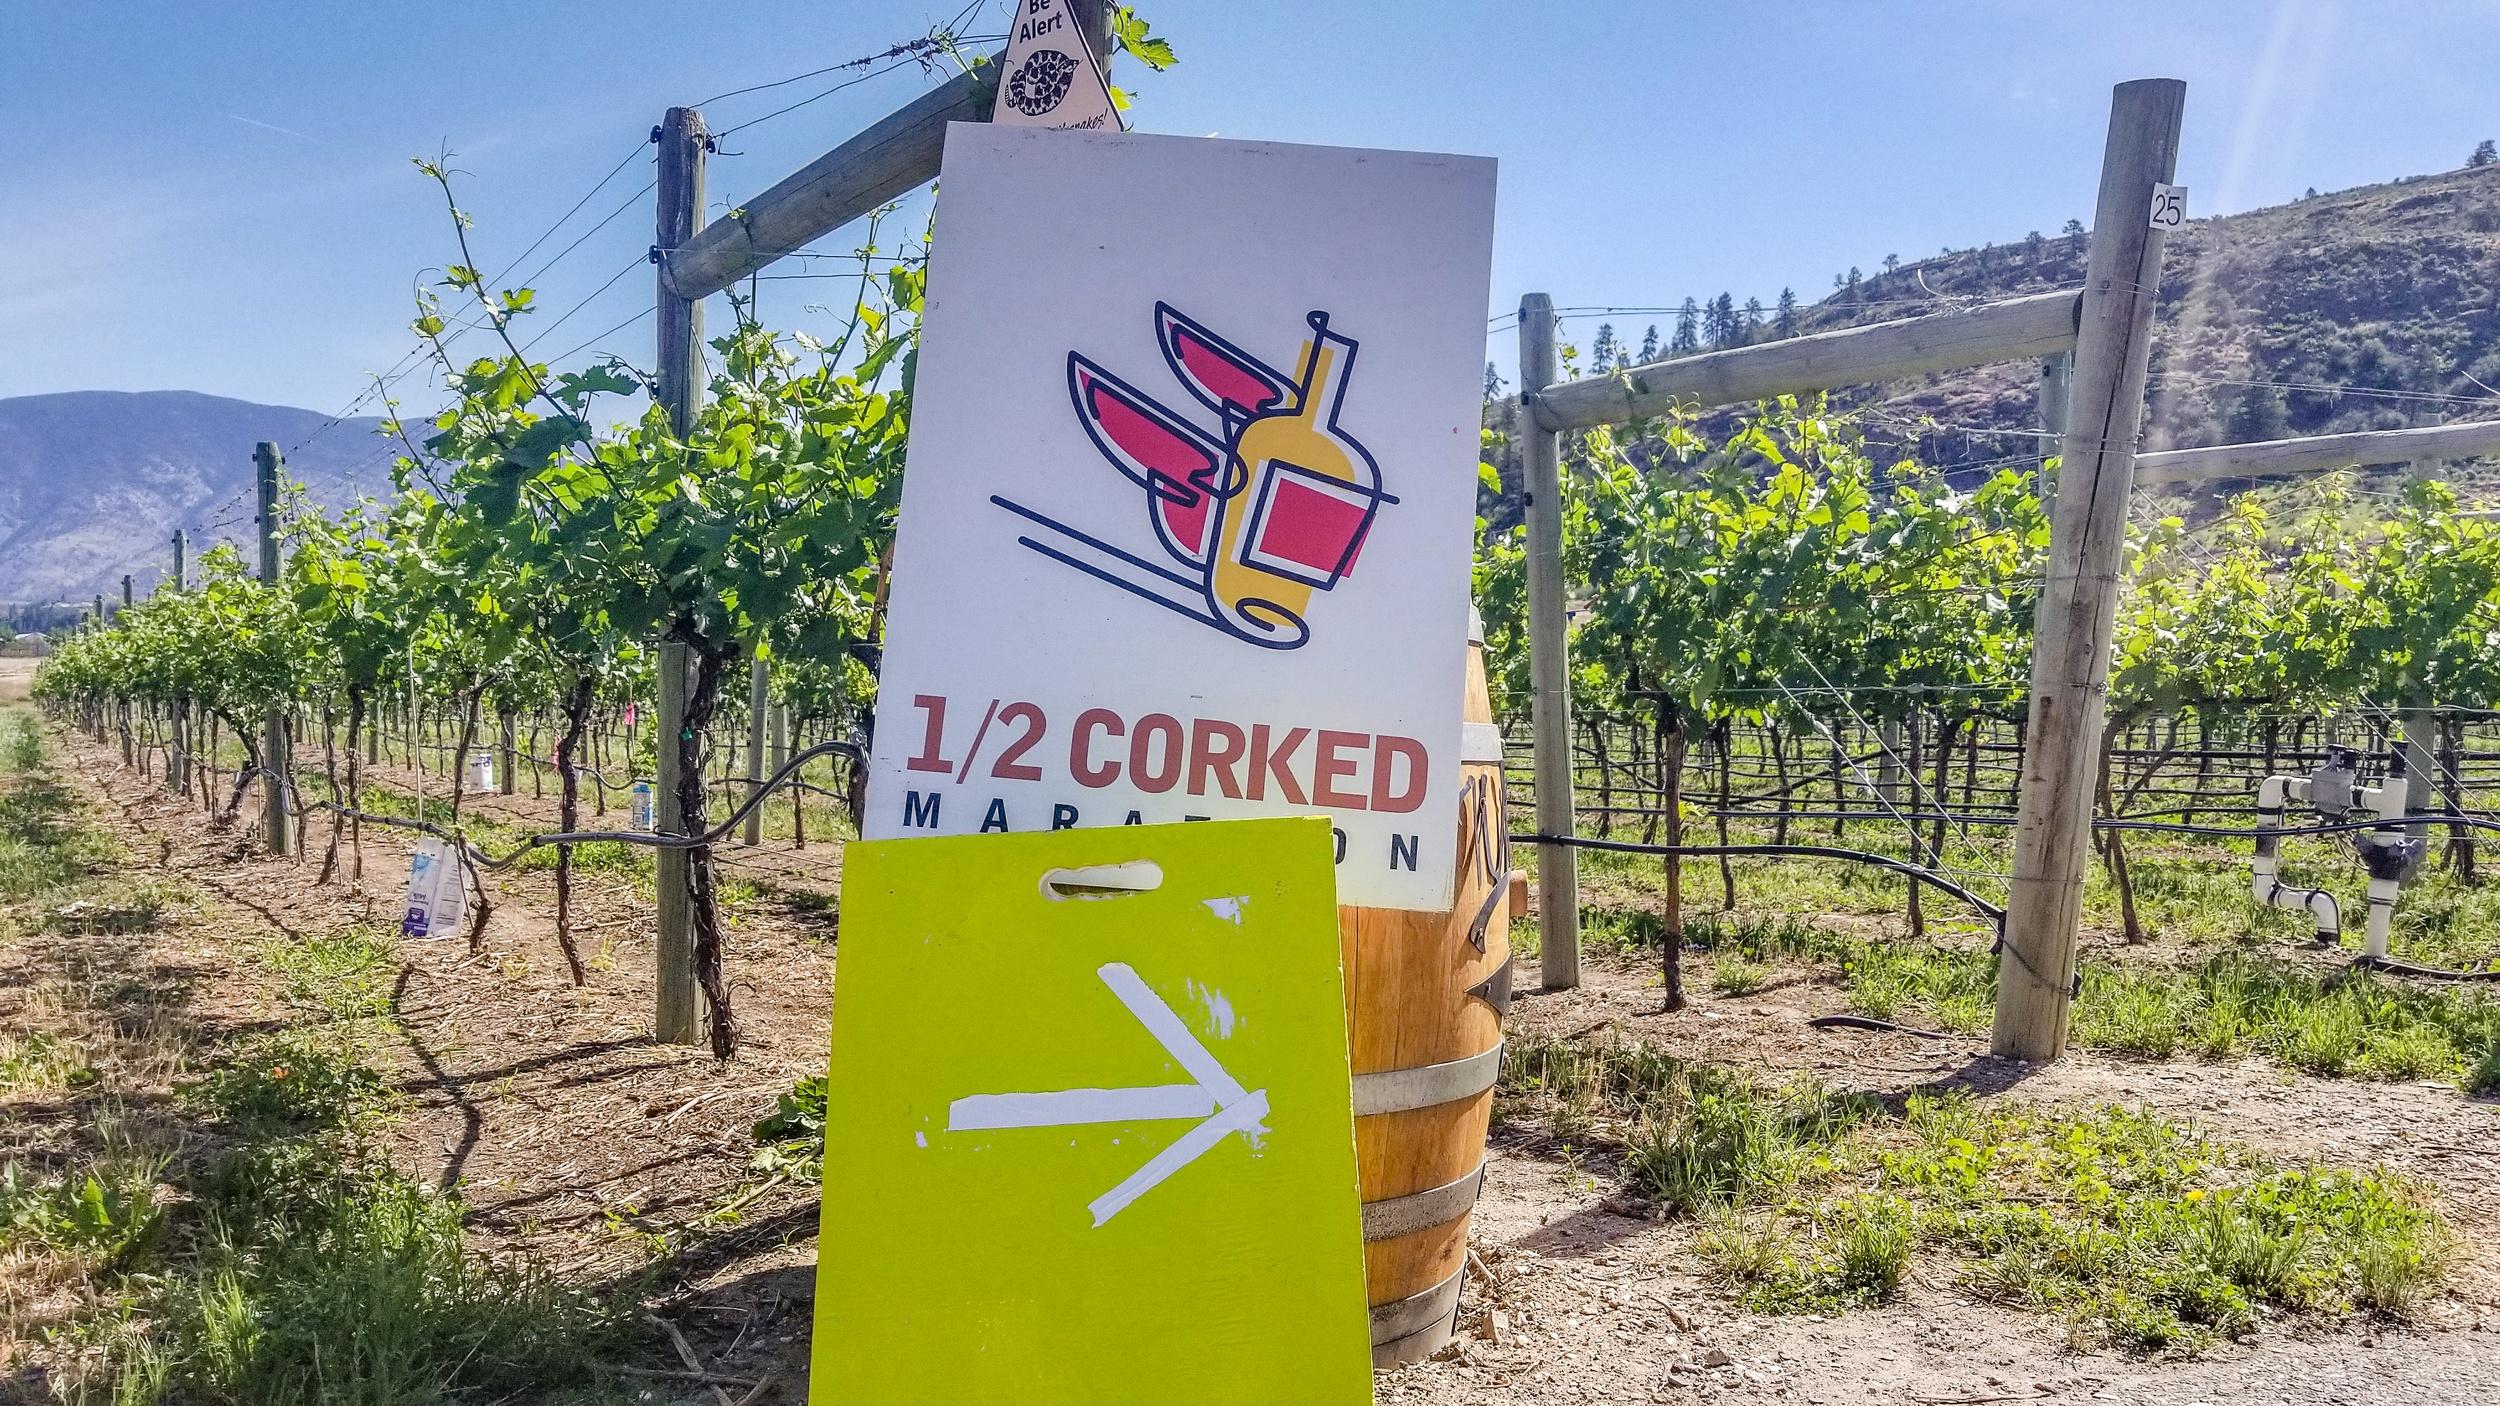 Half Corked Marathon wine run in Osoyoos, B.C.